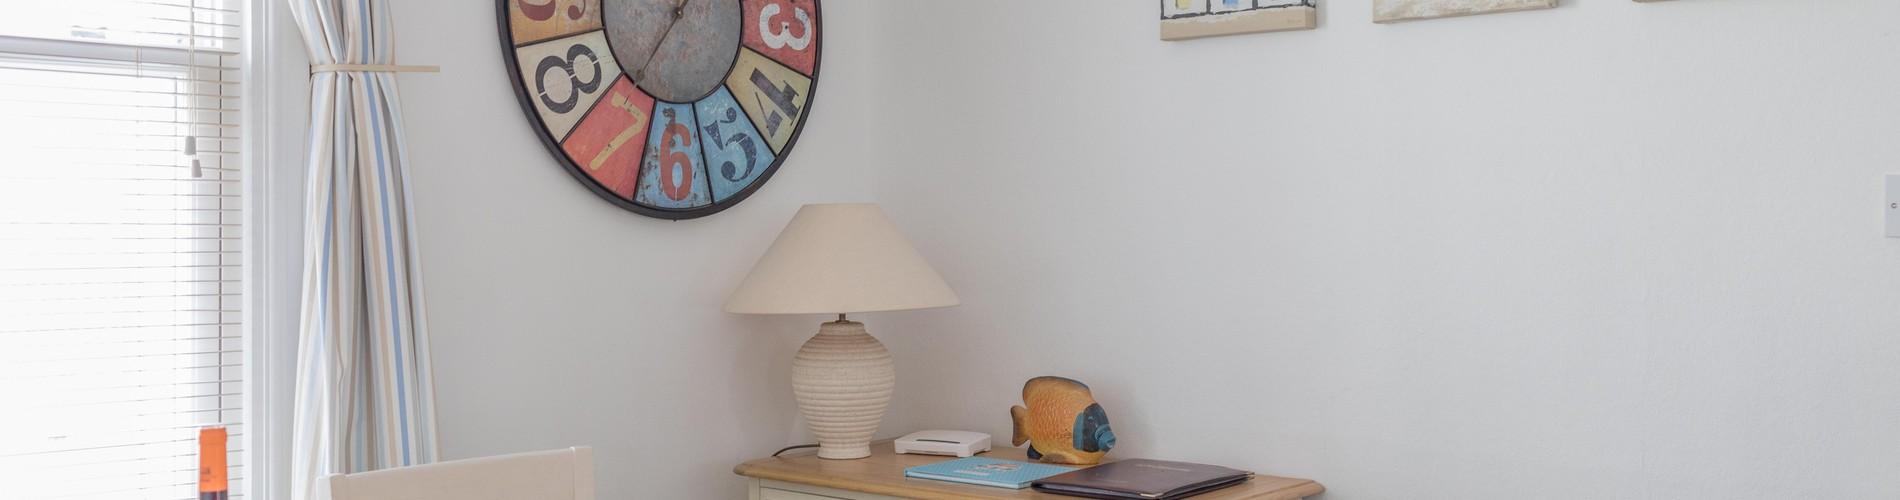 Vacation Rental Blue Cottage